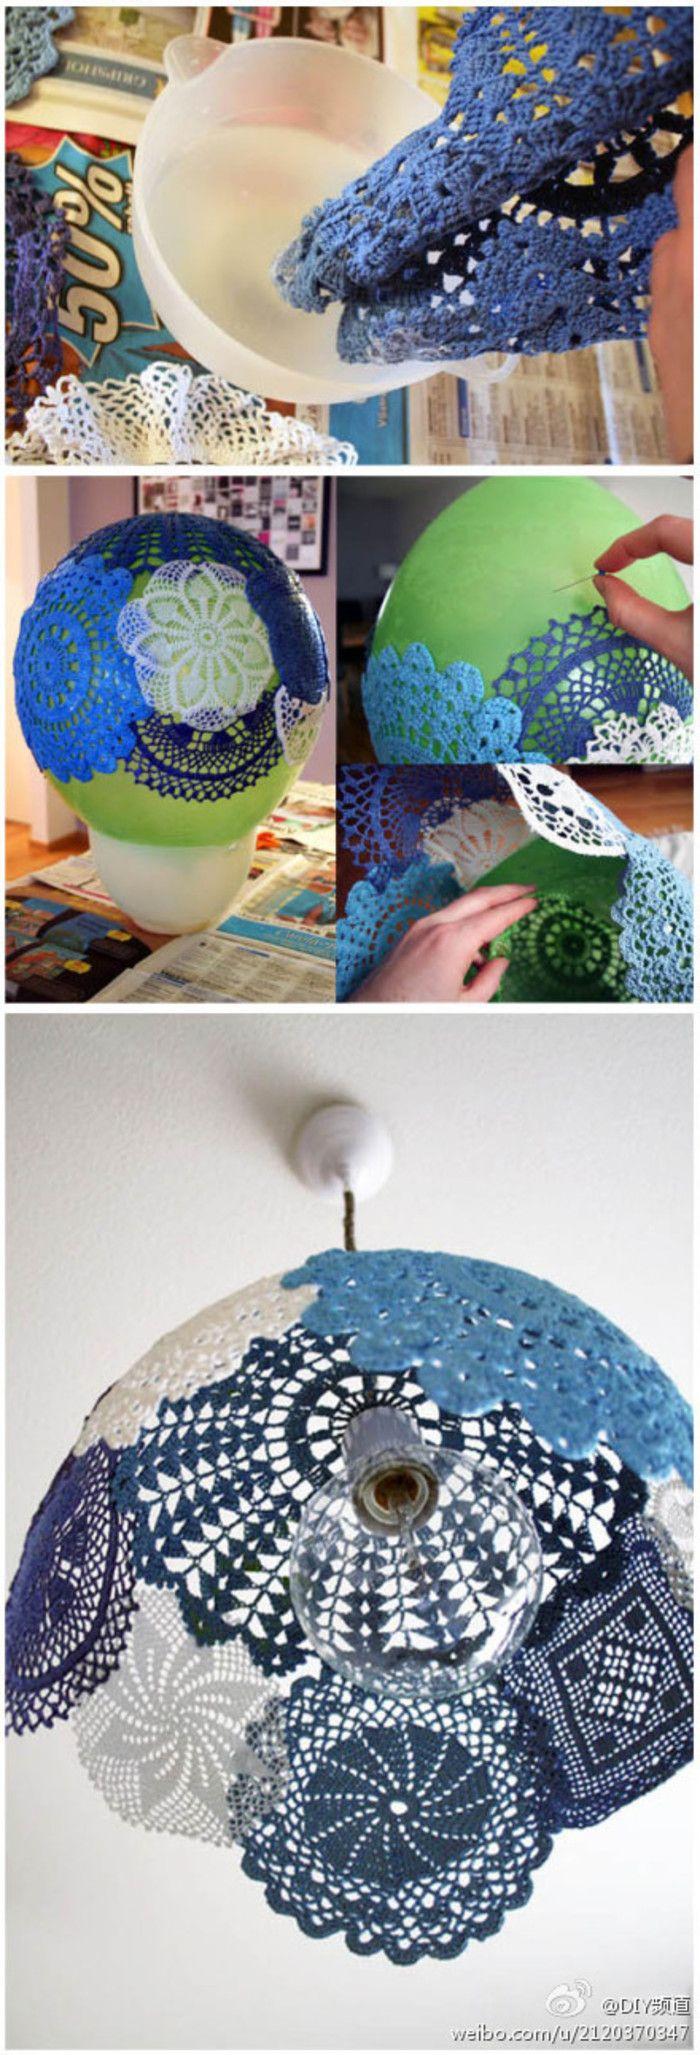 DIY Doily Decoration Ideas